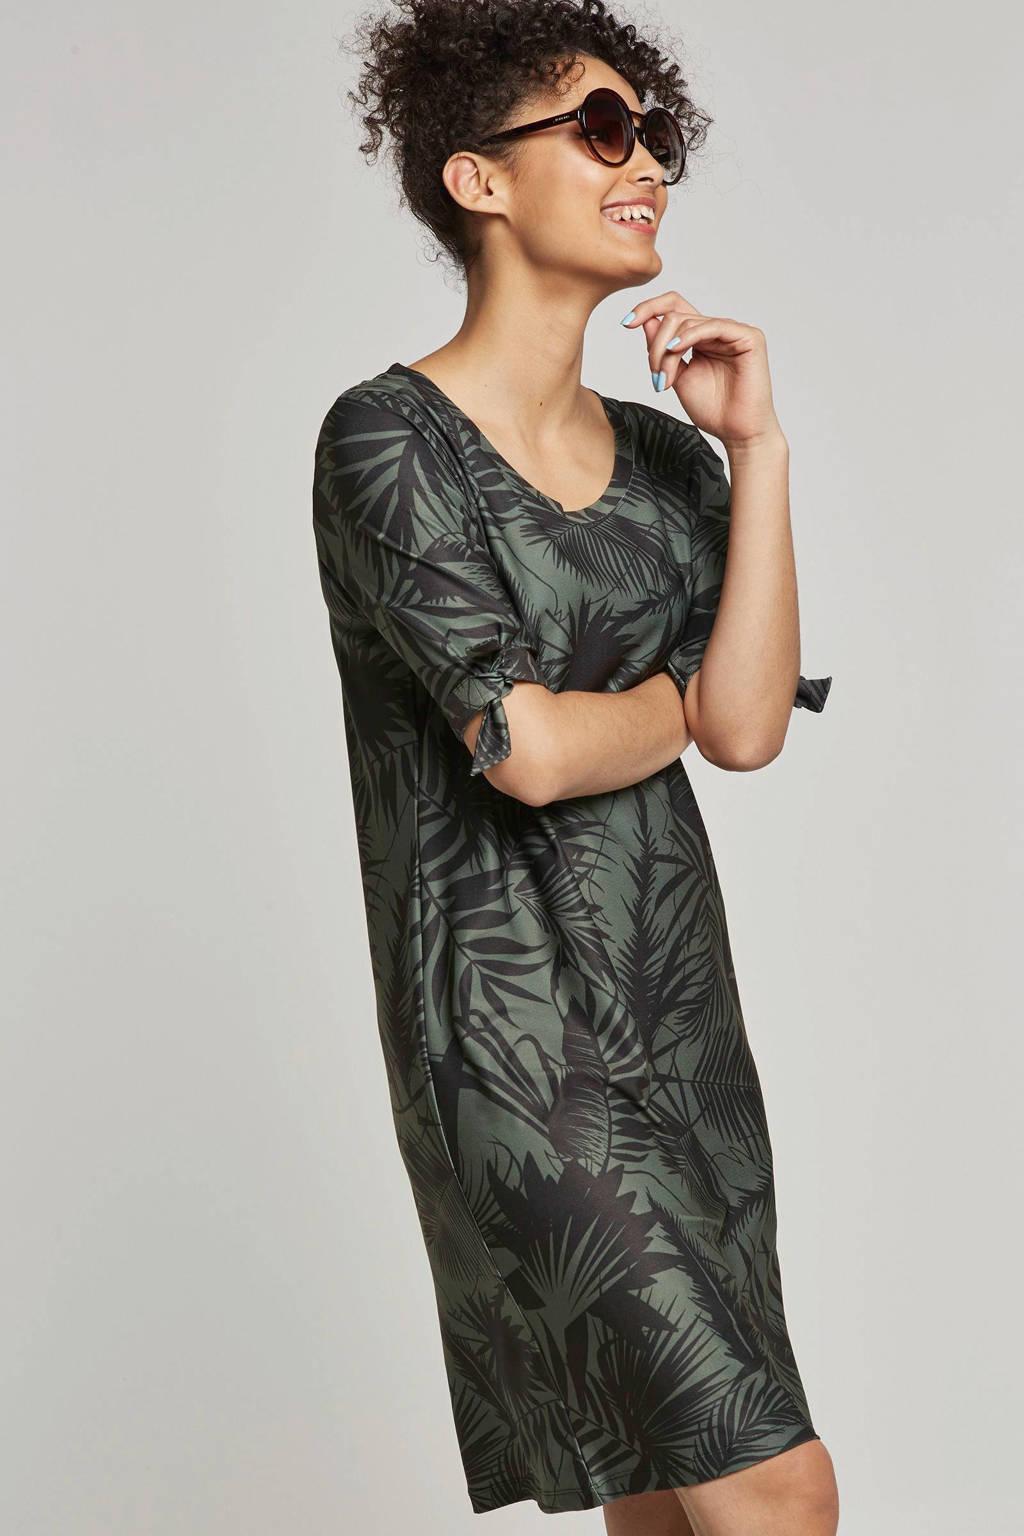 whkmp's beachwave jurk met palmprint, Groen/zwart